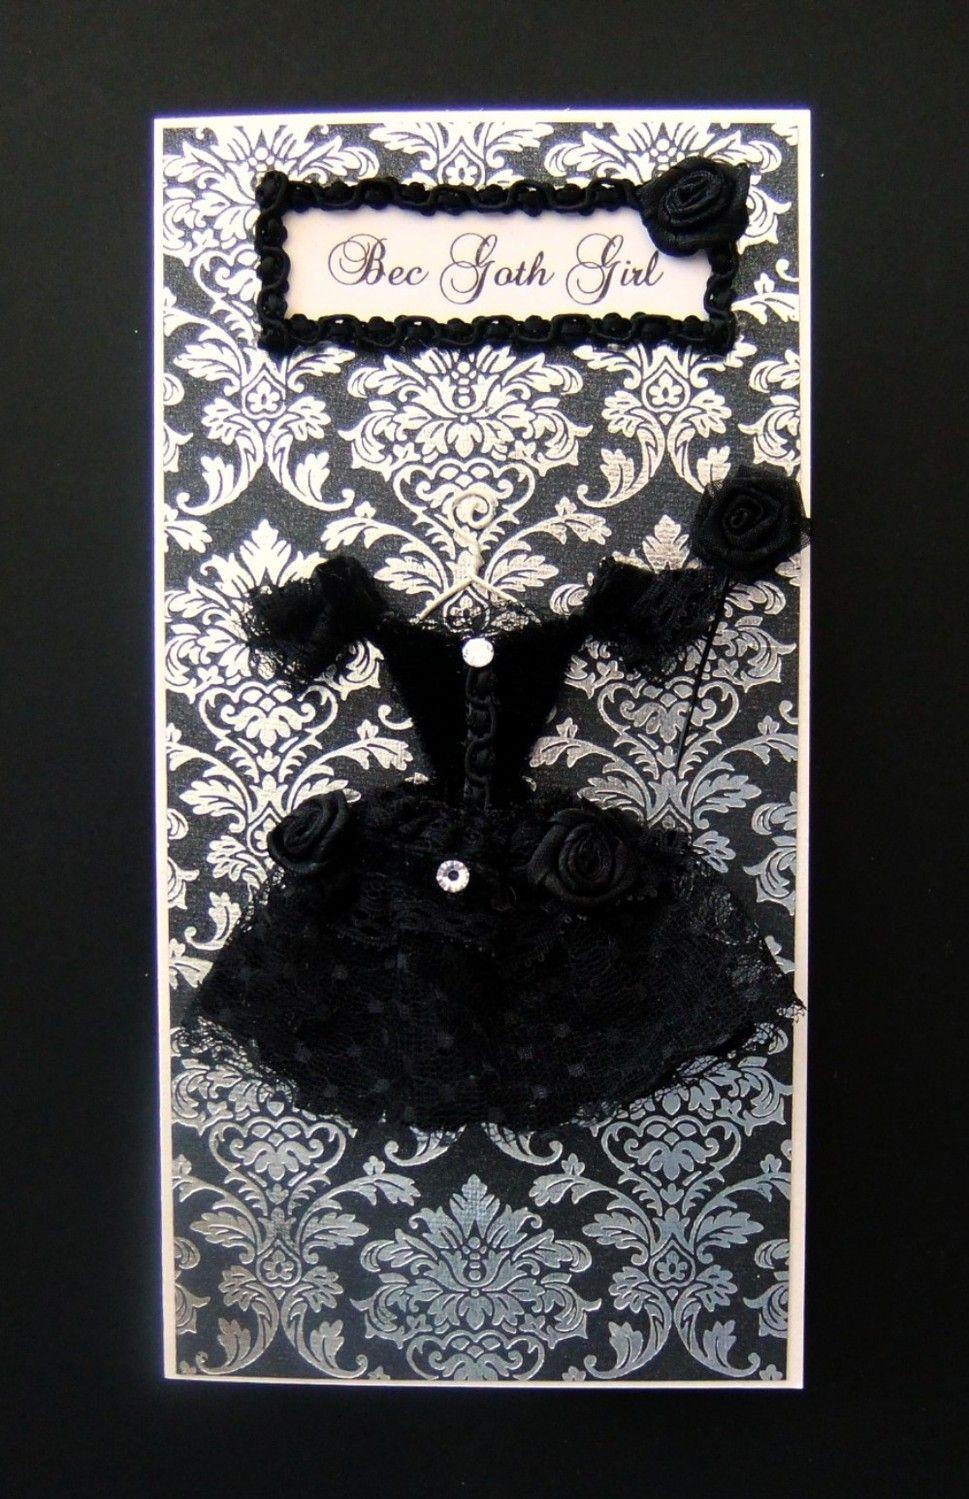 Handmade Gothic Harajuku Fashion W H Naoto Spiderweb Bag: Bec Goth Girl Personalized Dress Card / DL Size / Handmade